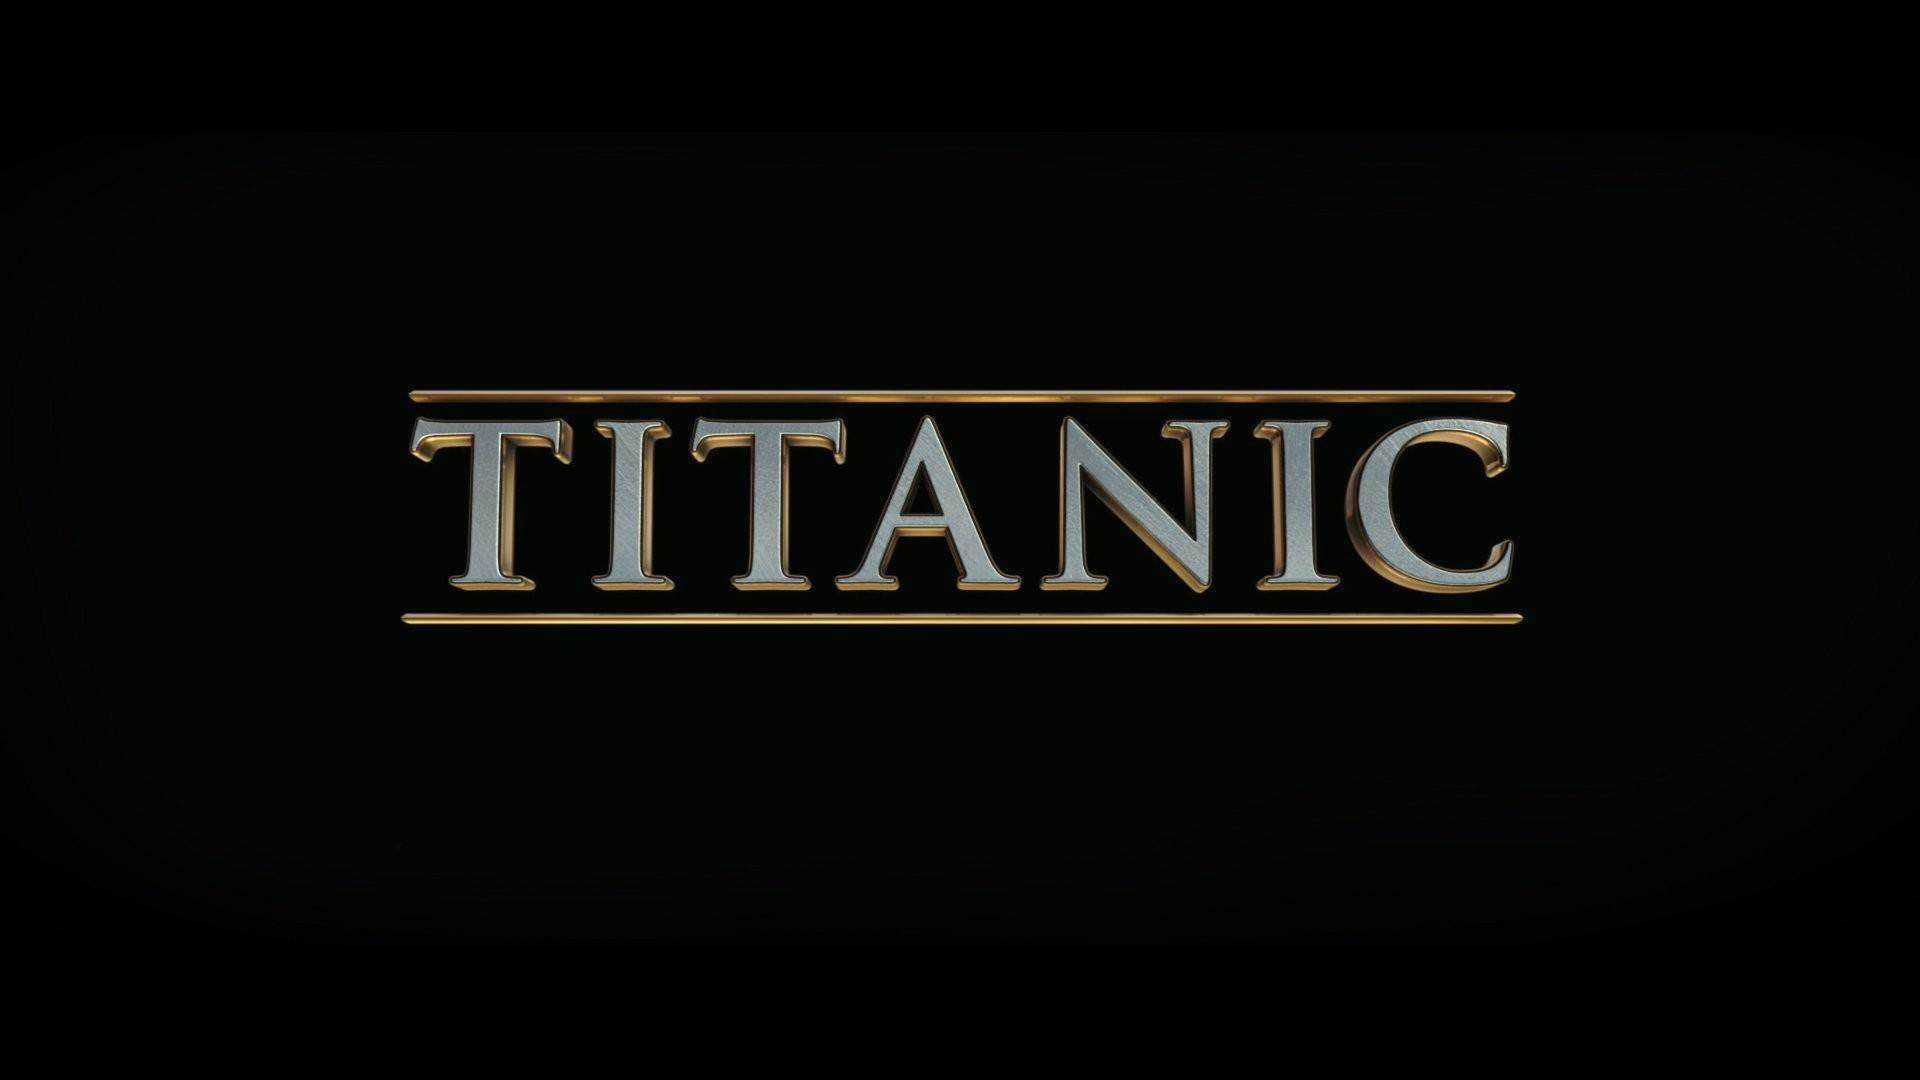 Titanic Wallpaper 77 Images